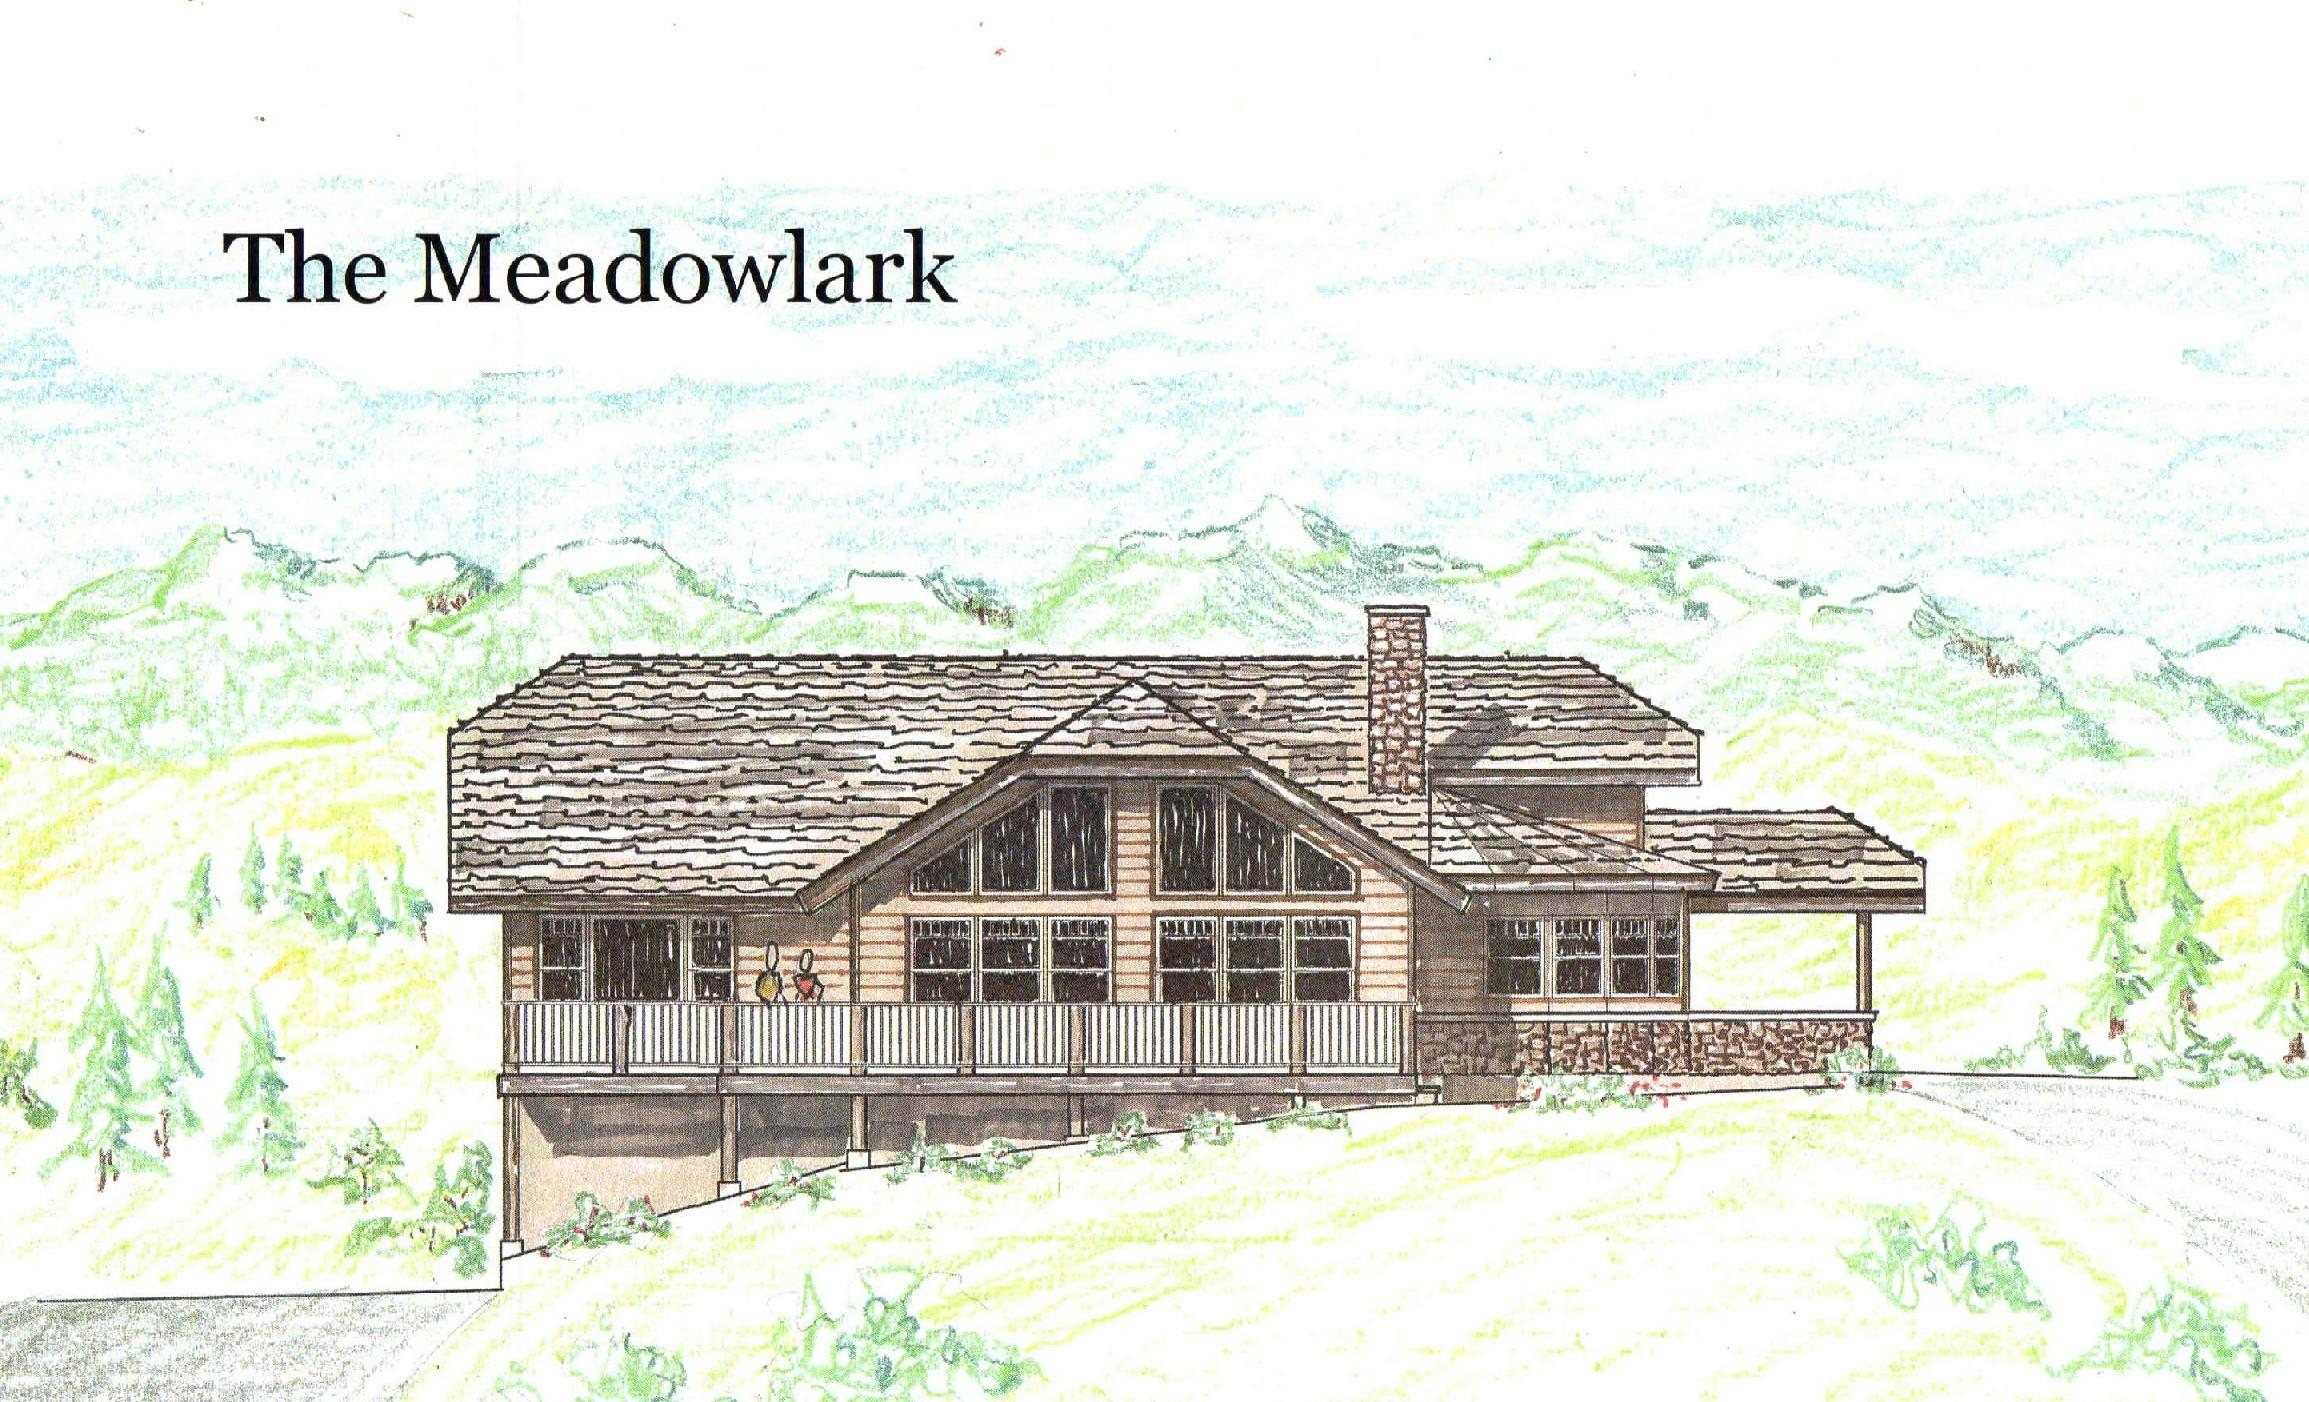 Meadowlark jpg